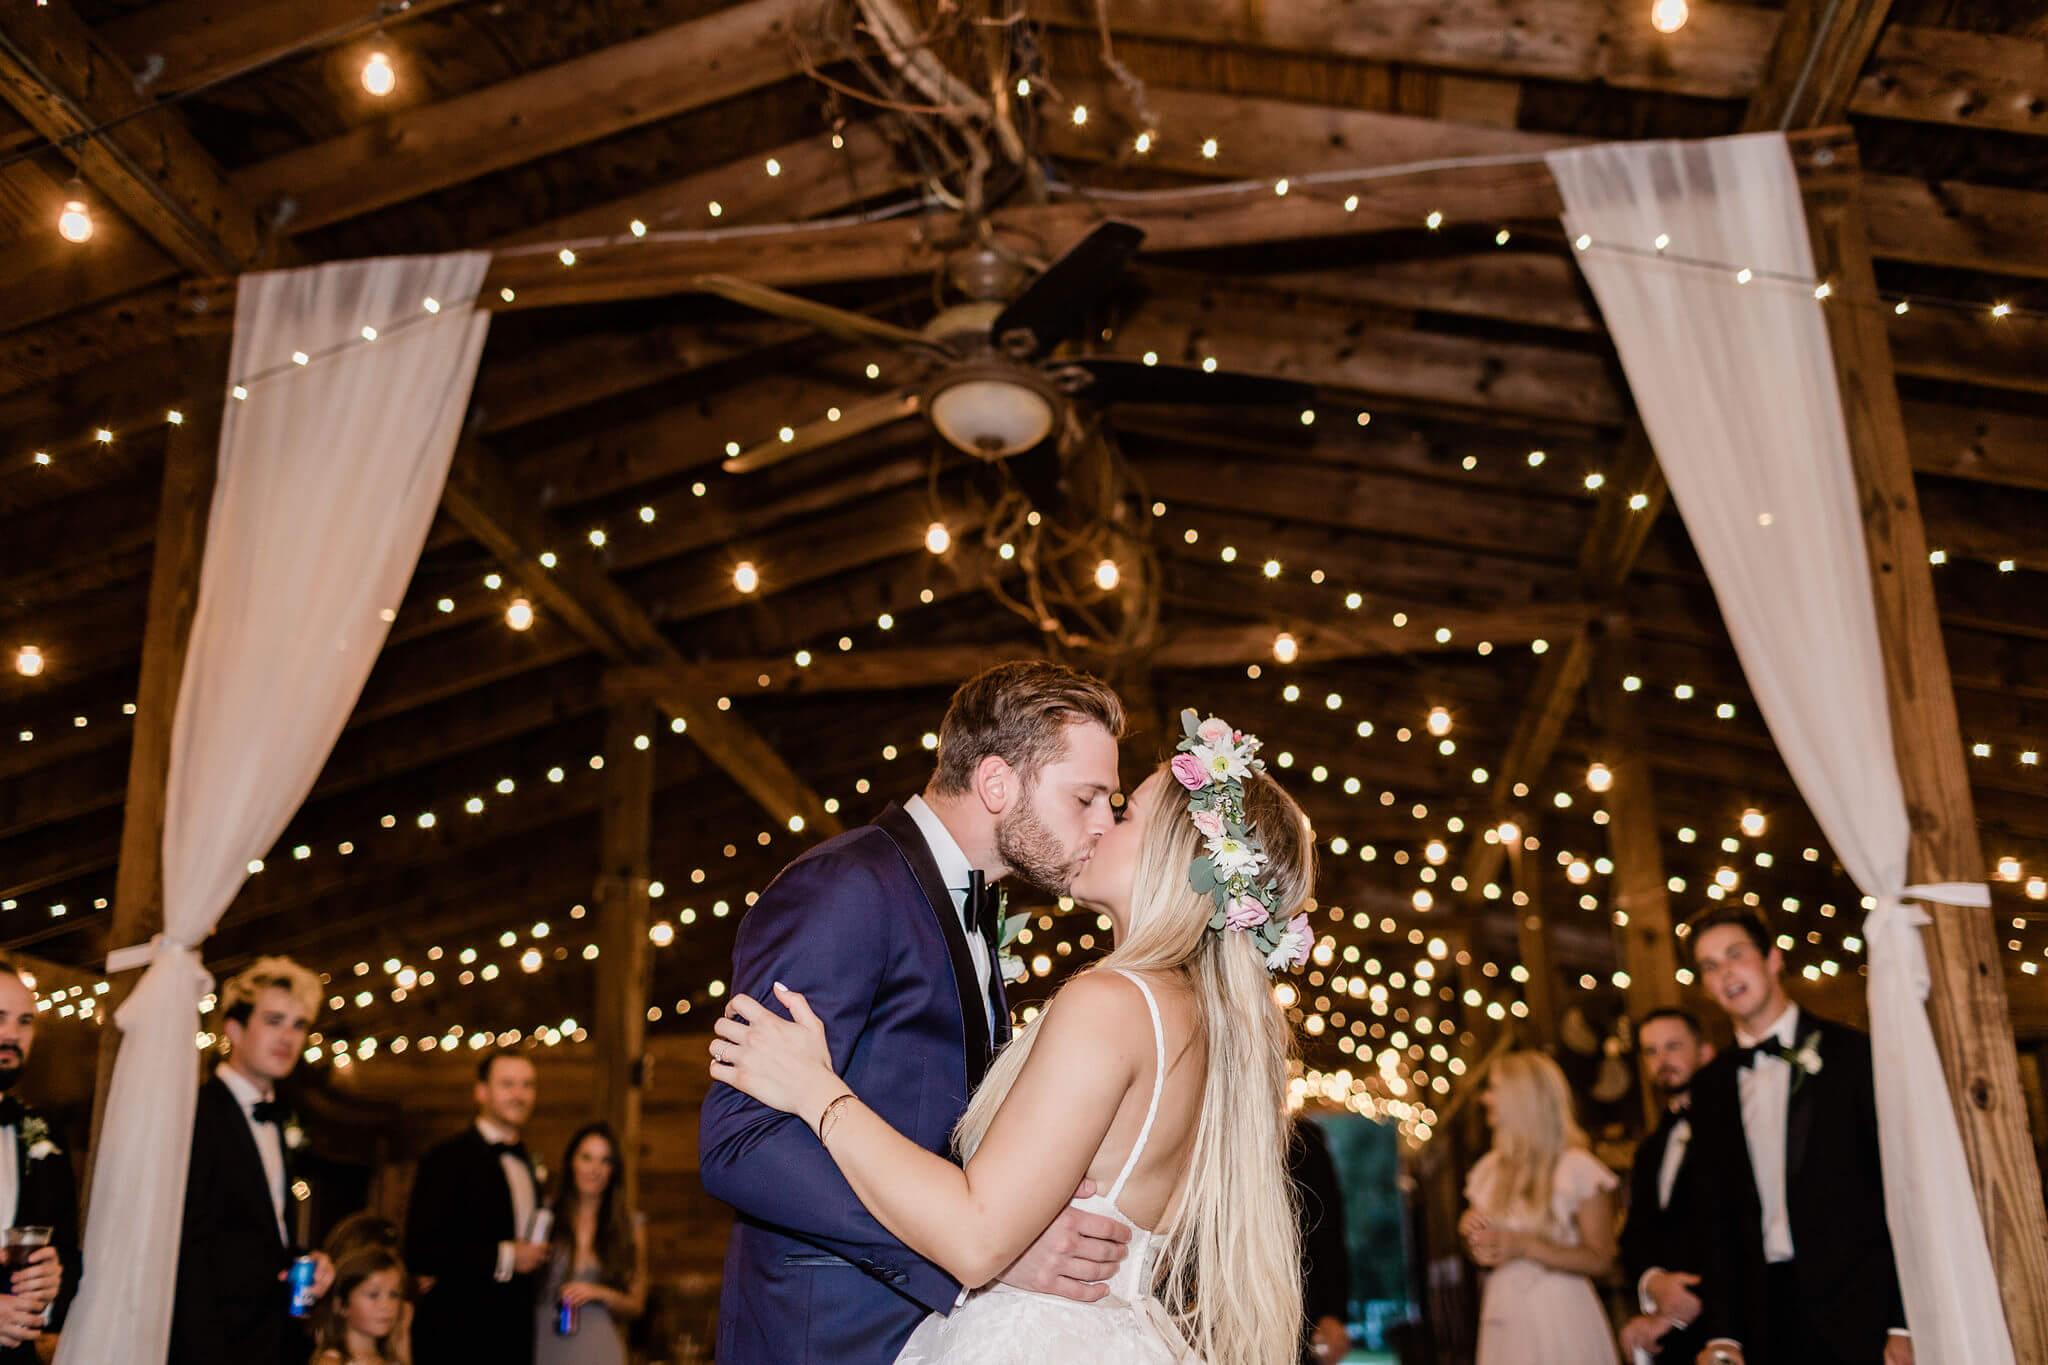 apt-b-photography-savannah-wedding-photographer-savannah-wedding-charleston-wedding-photographer-40.jpg